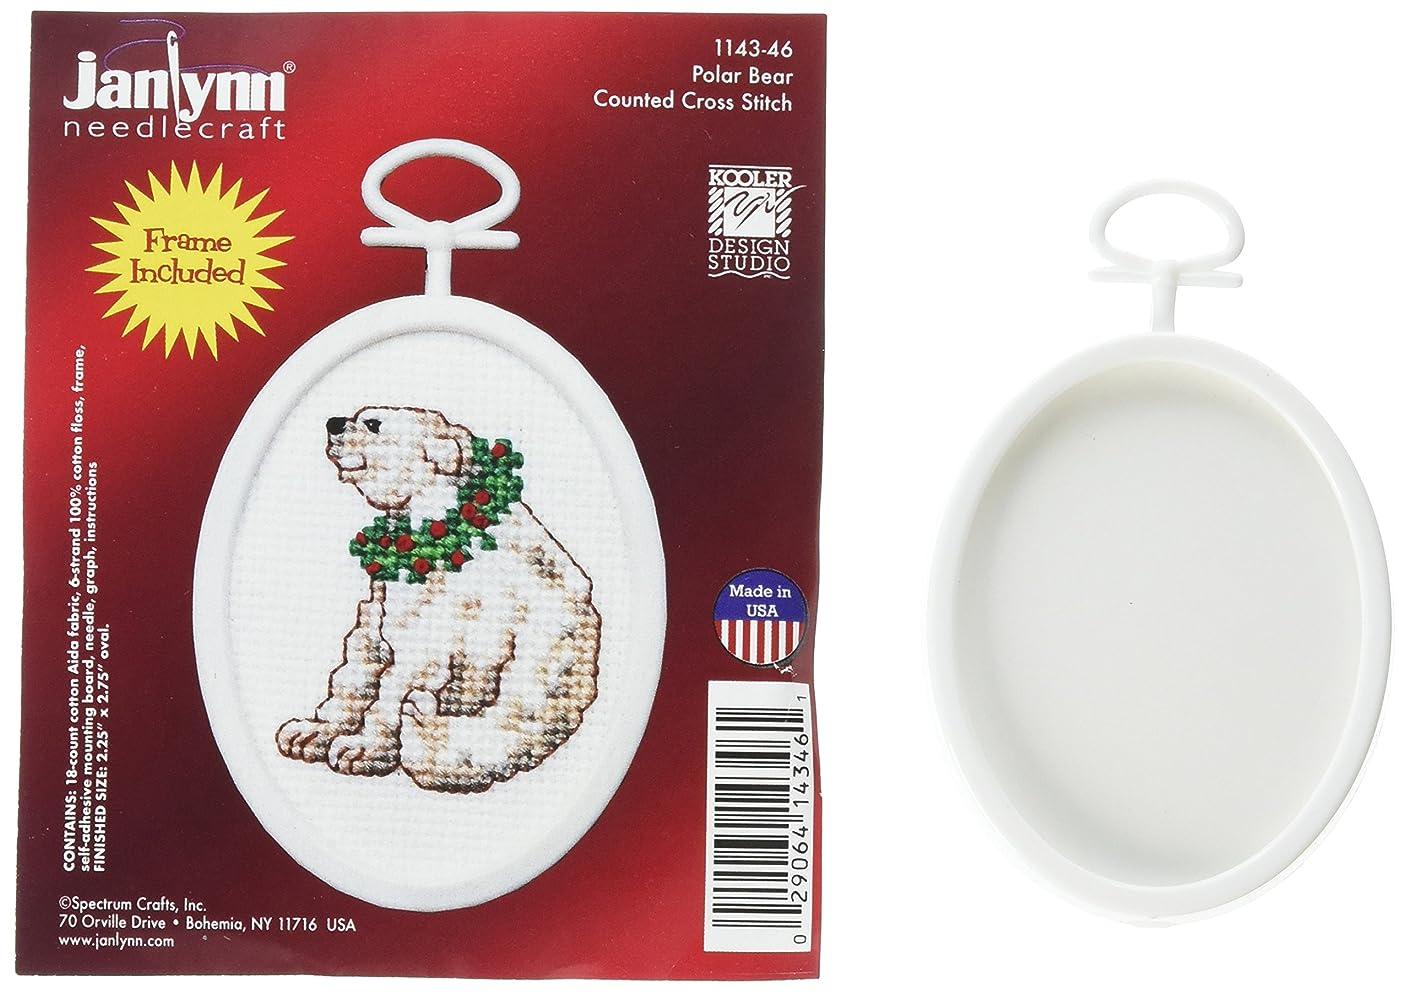 Janlynn 1143-46 18 Count Mini Counted Cross Stitch Kit, 2.75-Inch, Oval, Polar Bear